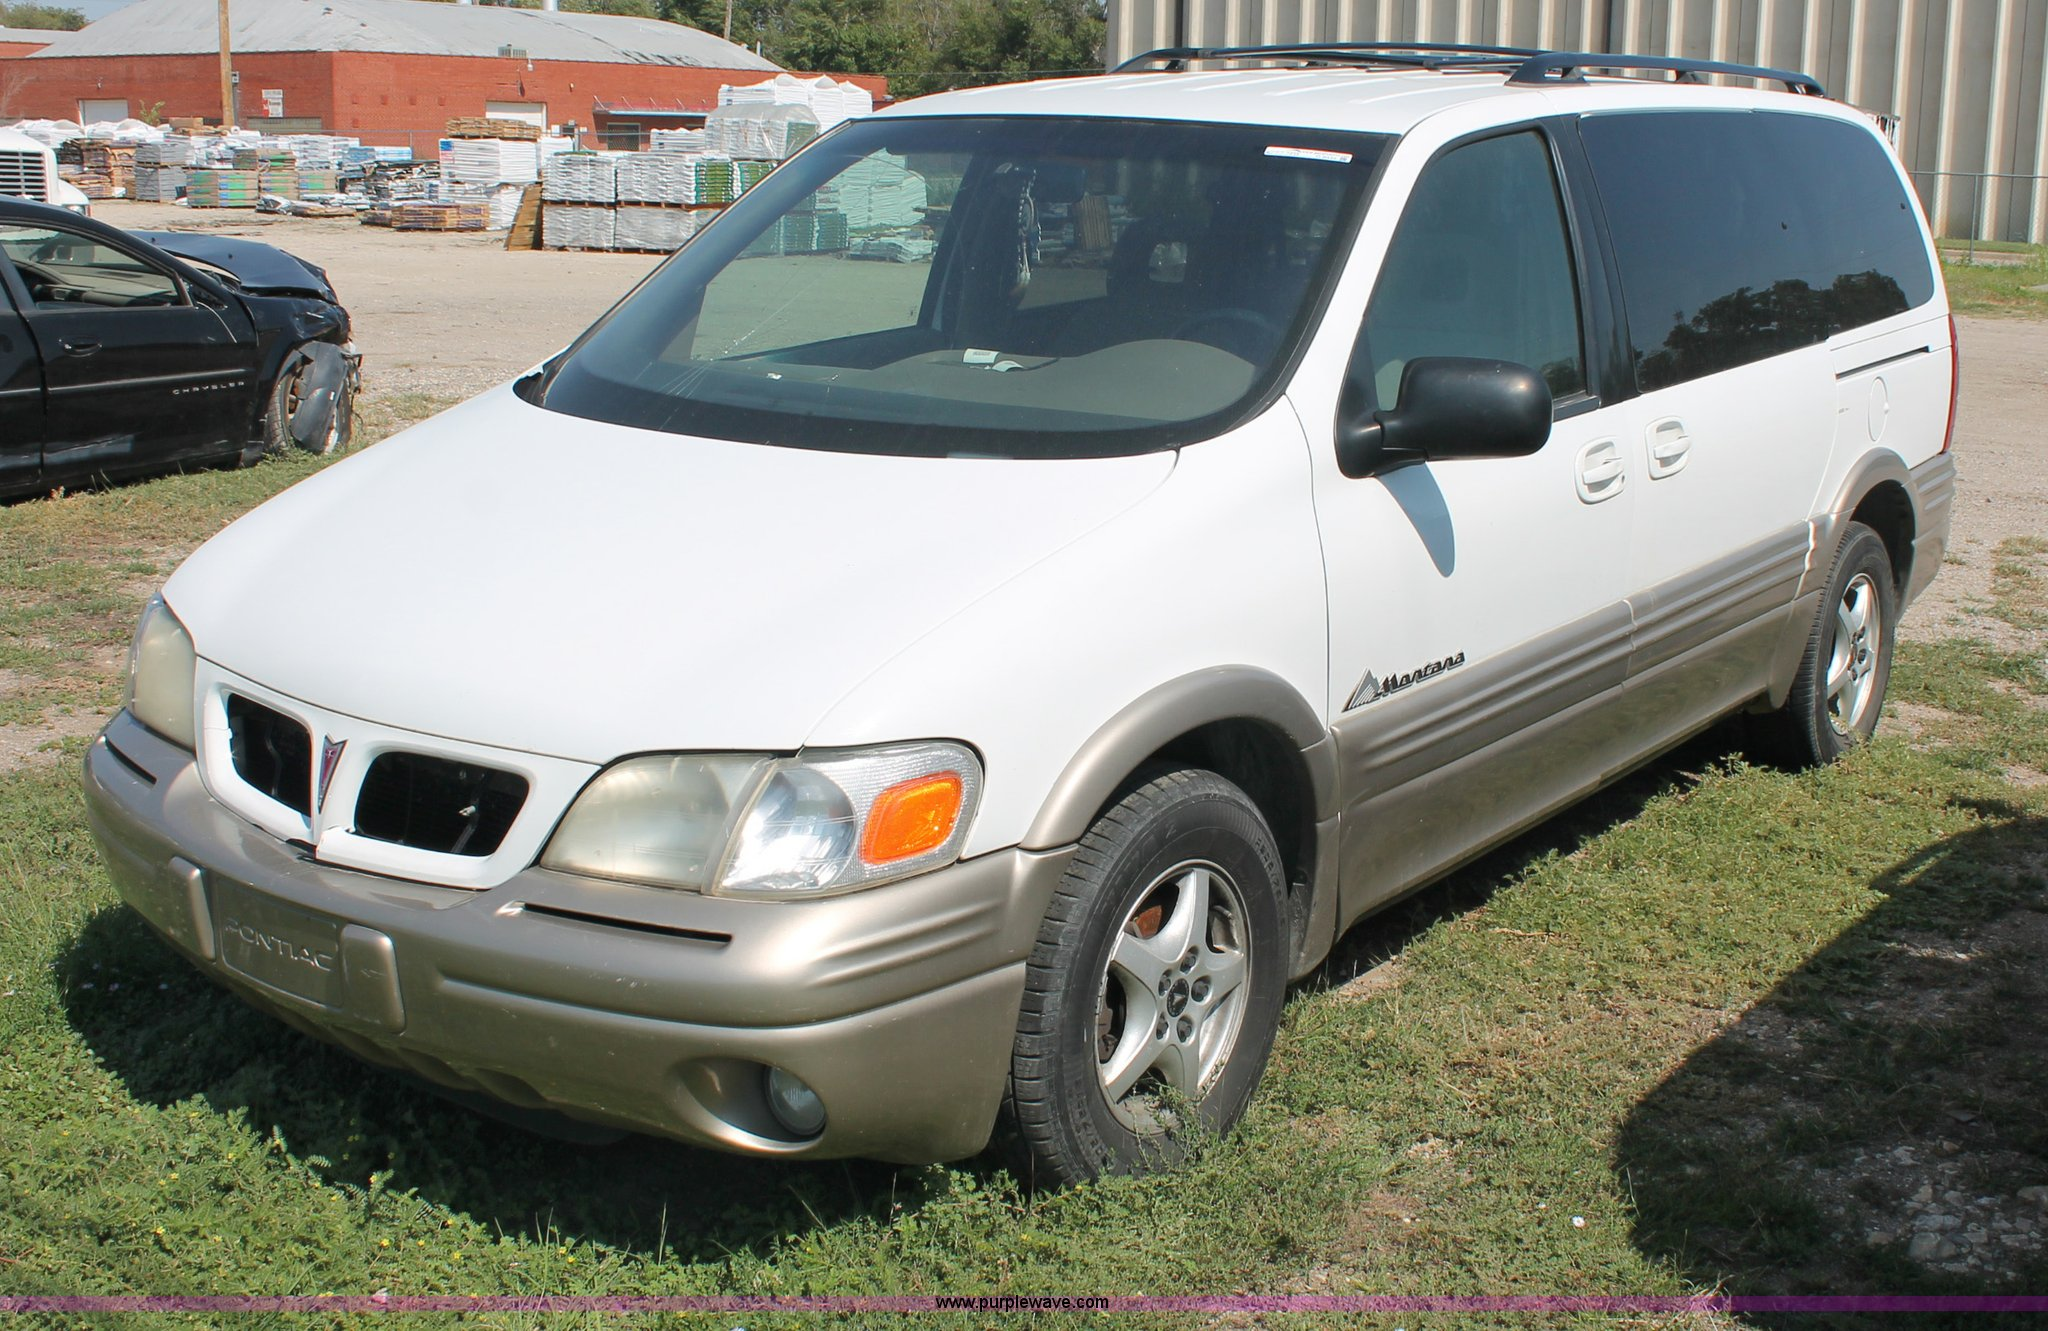 1999 pontiac montana mini van in wichita ks item o9339 sold purple wave 1999 pontiac montana mini van in